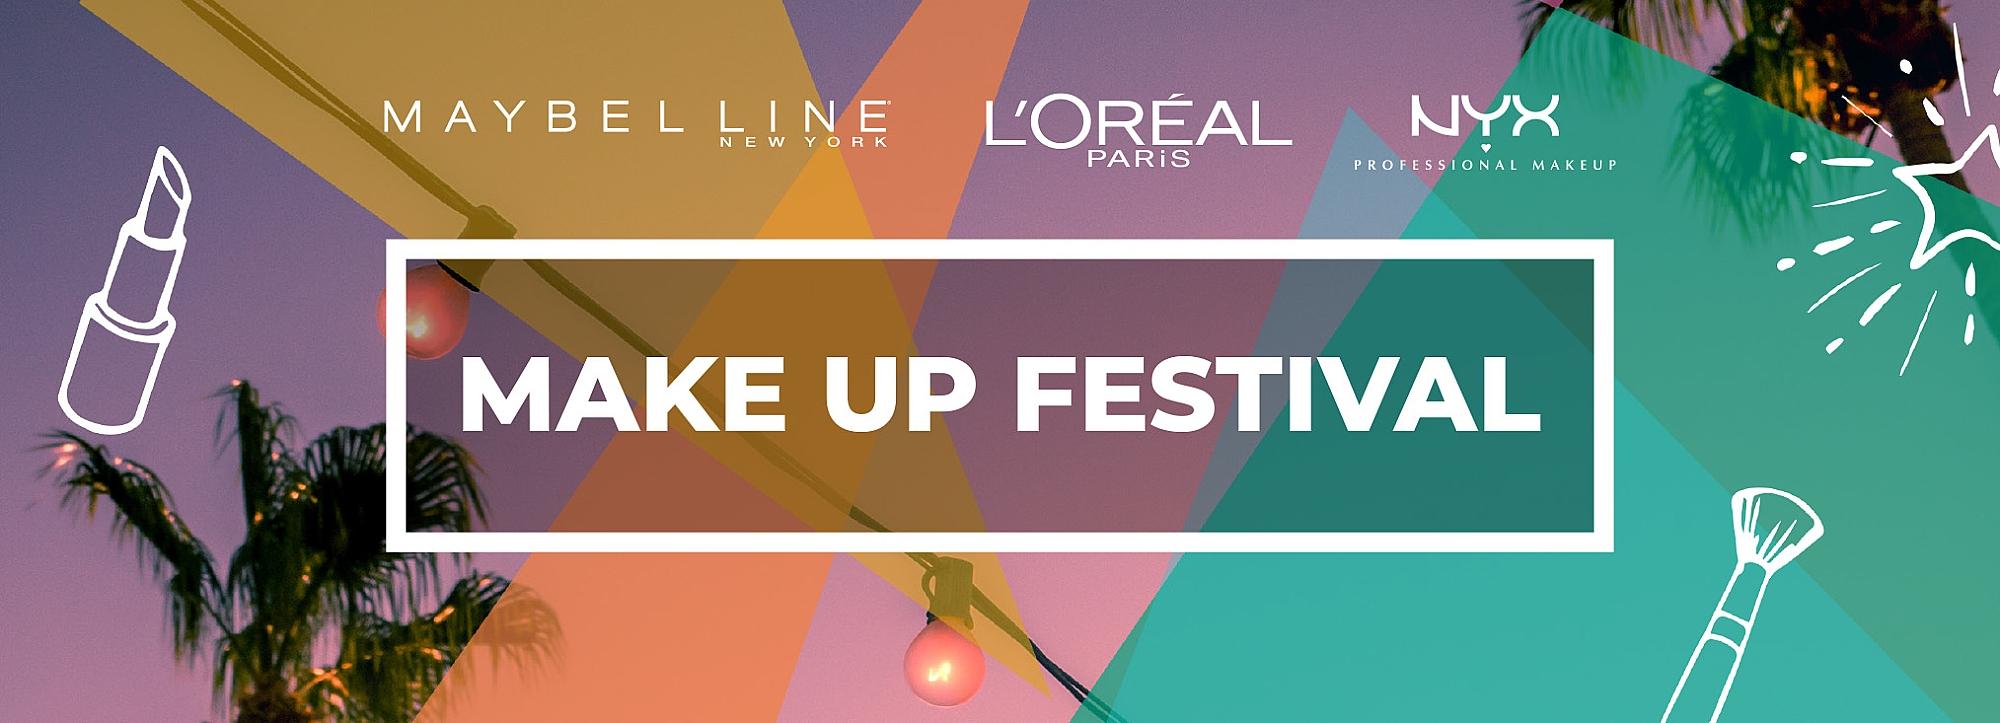 Makeup Festival